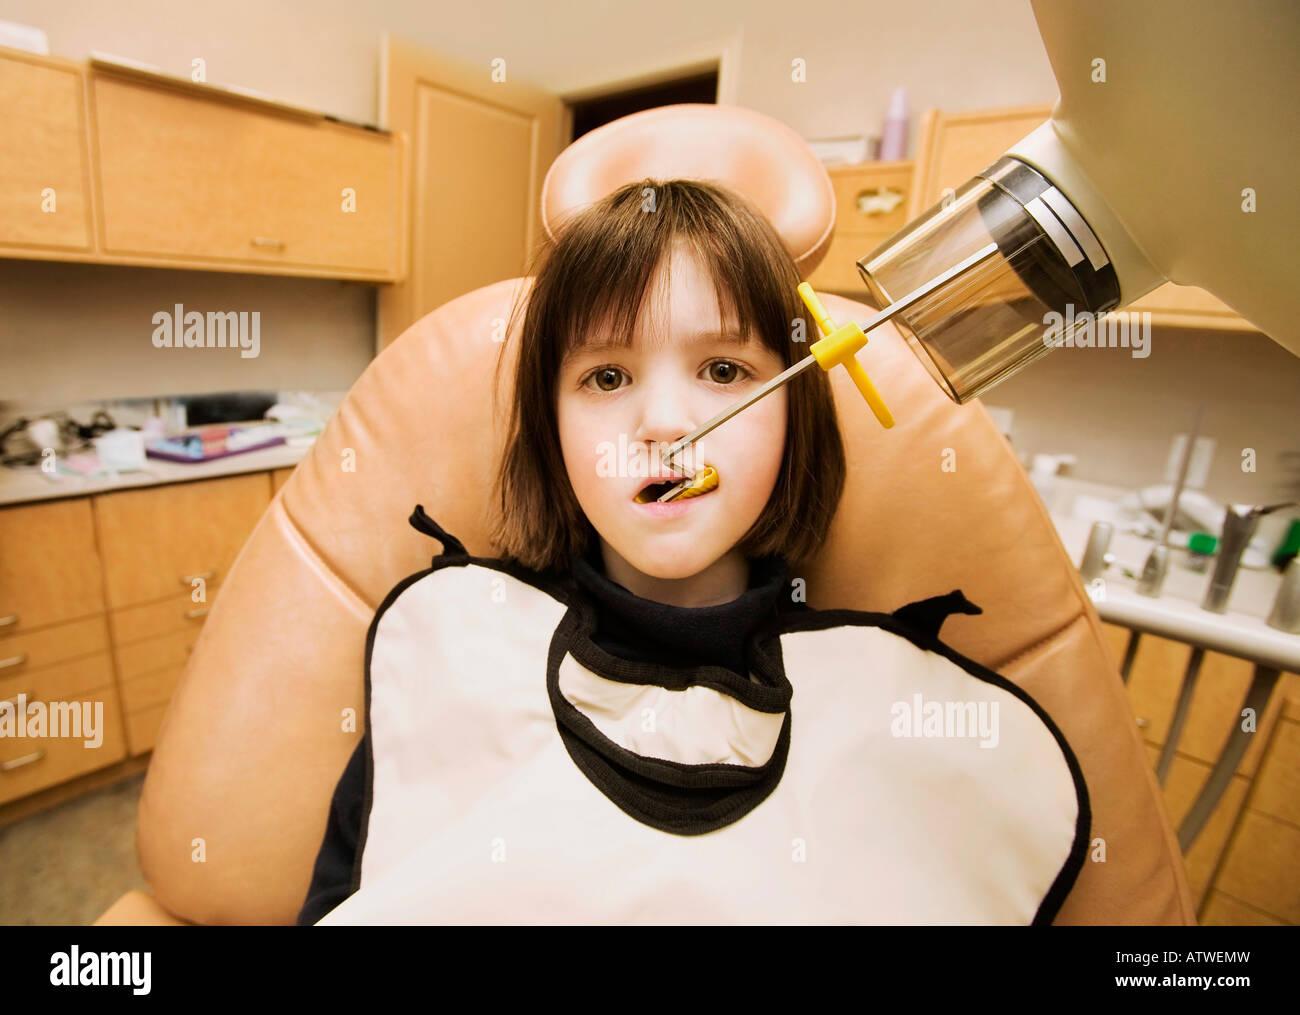 Girl getting dental x-ray - Stock Image